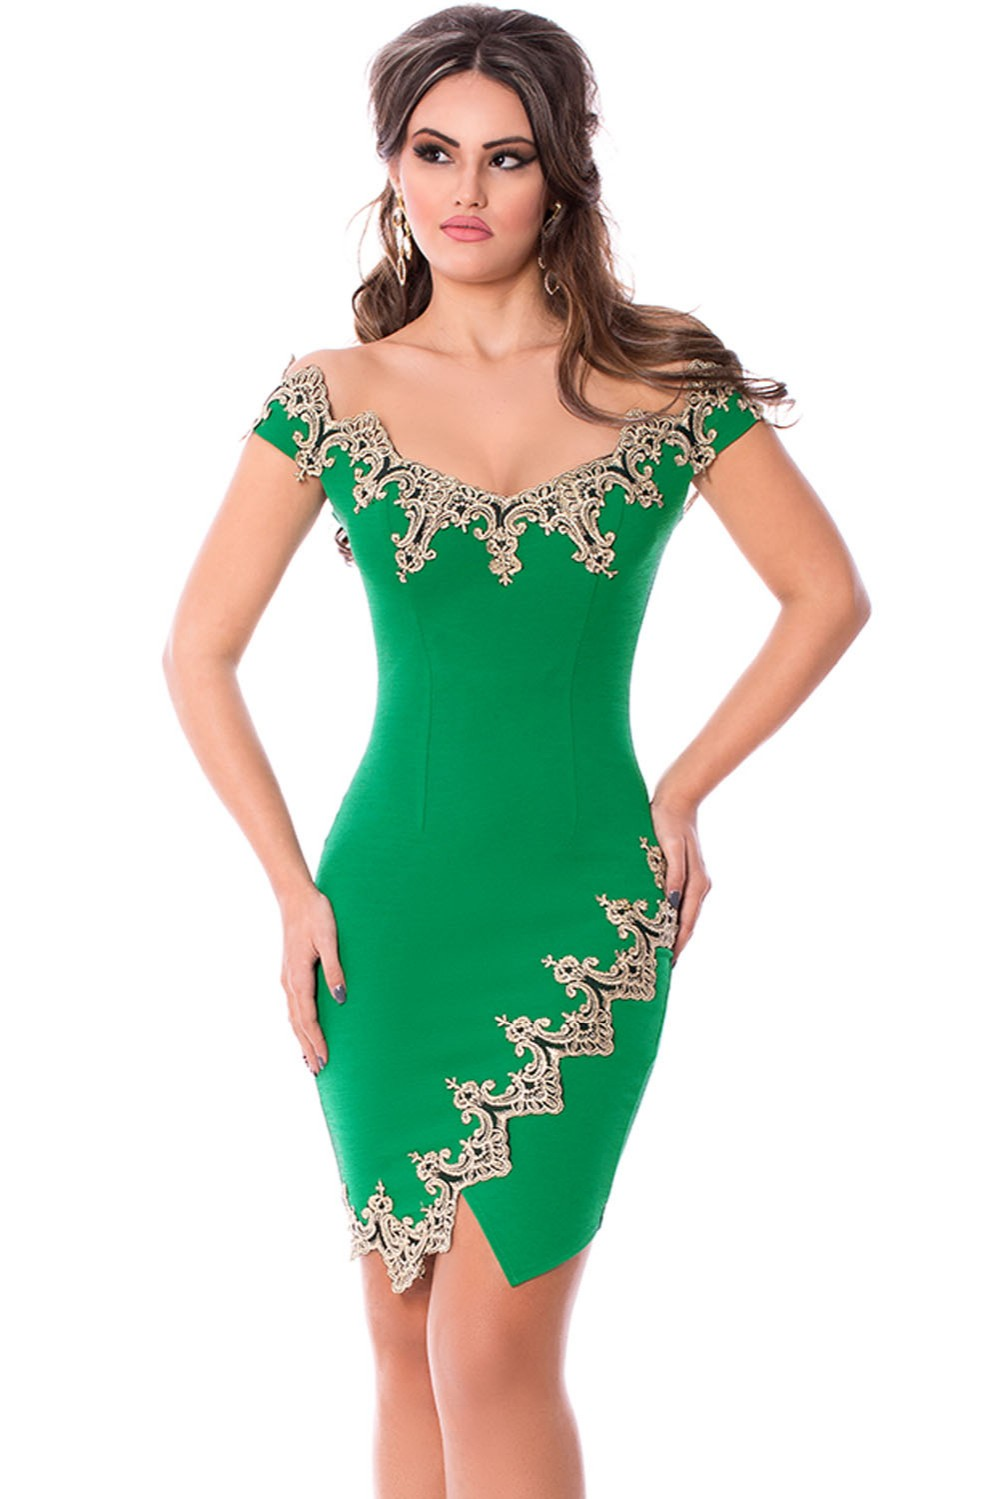 Gold-Lace-Applique-Green-Off-Shoulder-Mini-Dress-LC22715-9-1